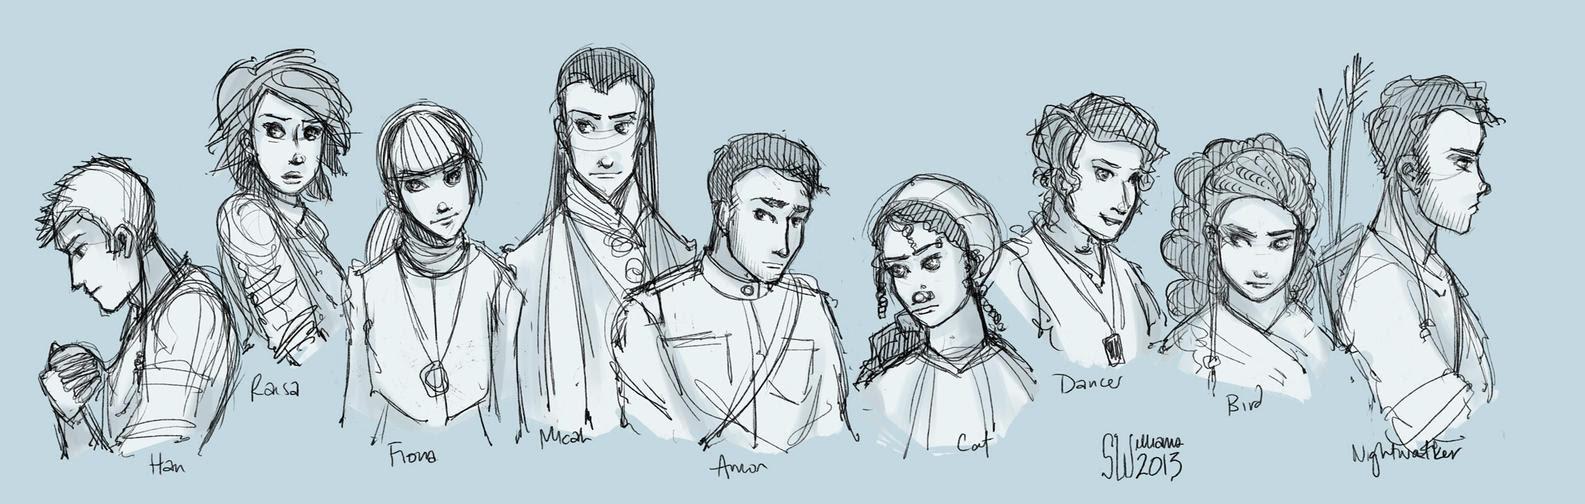 Exiled Queen - Sketch Dump by leabharlann